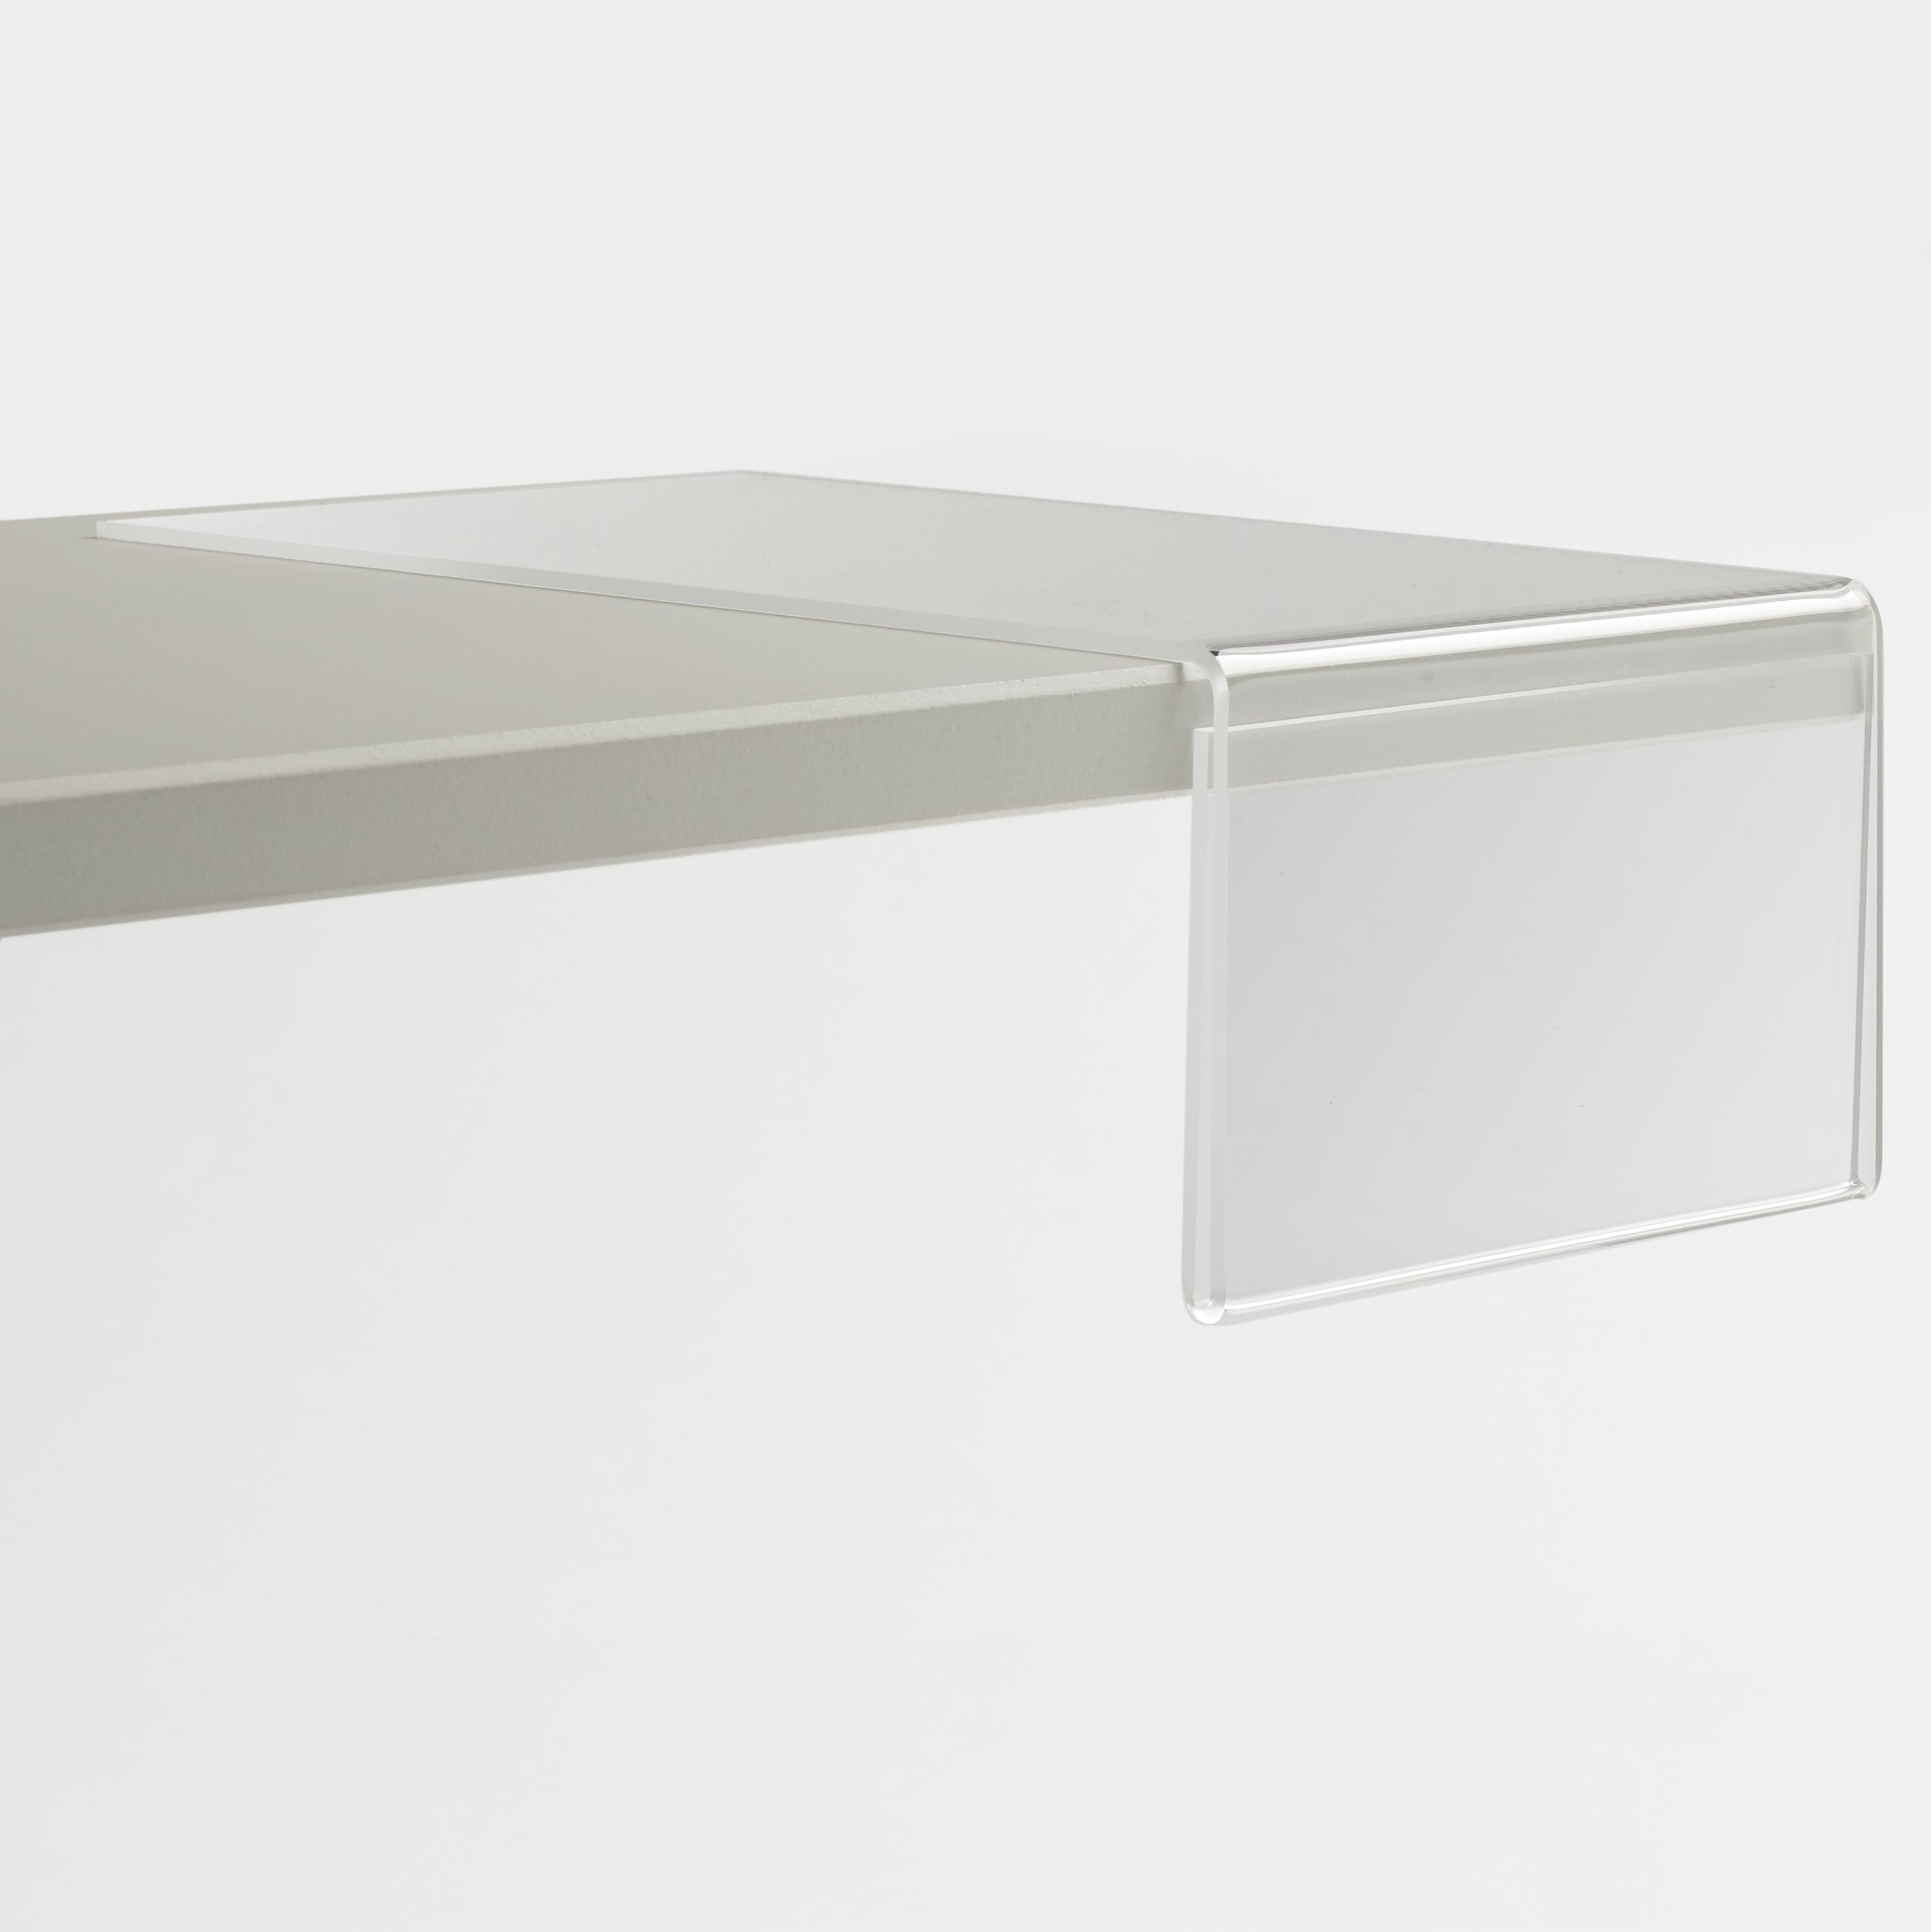 3x5 Shelf Talker Acrylic Sign Holder Buy Acrylic